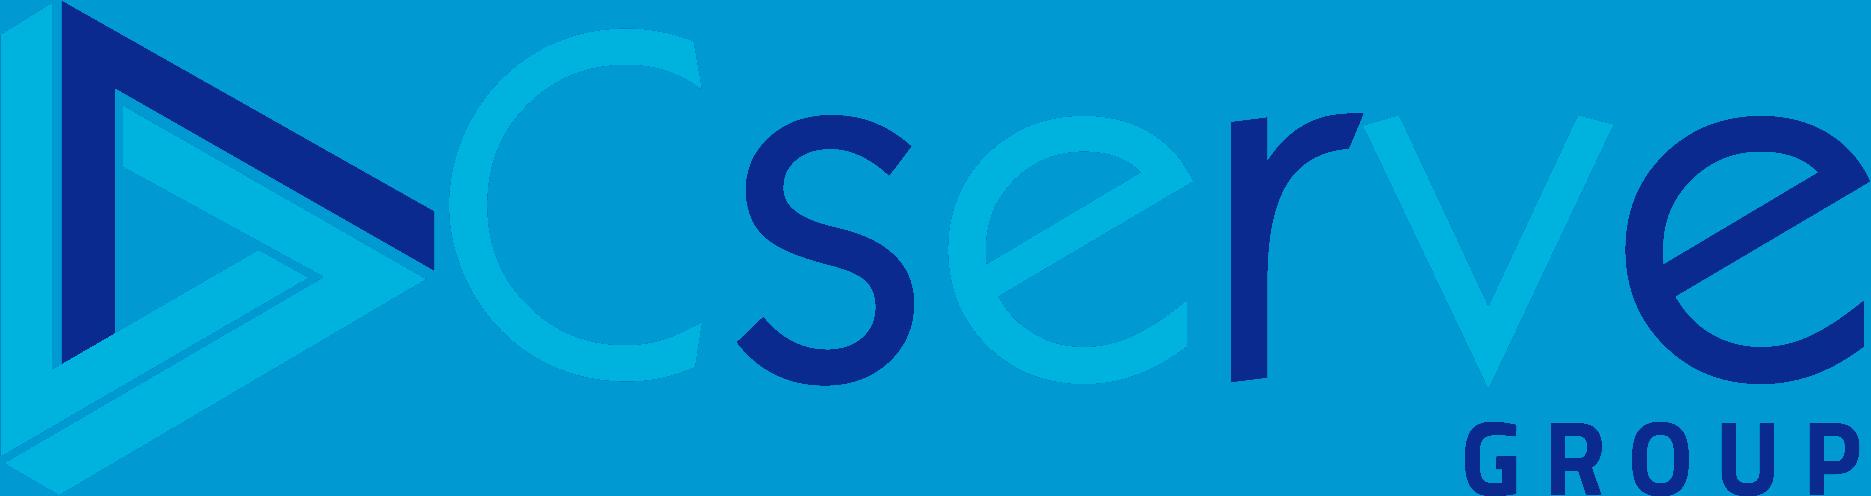 Cserve Group